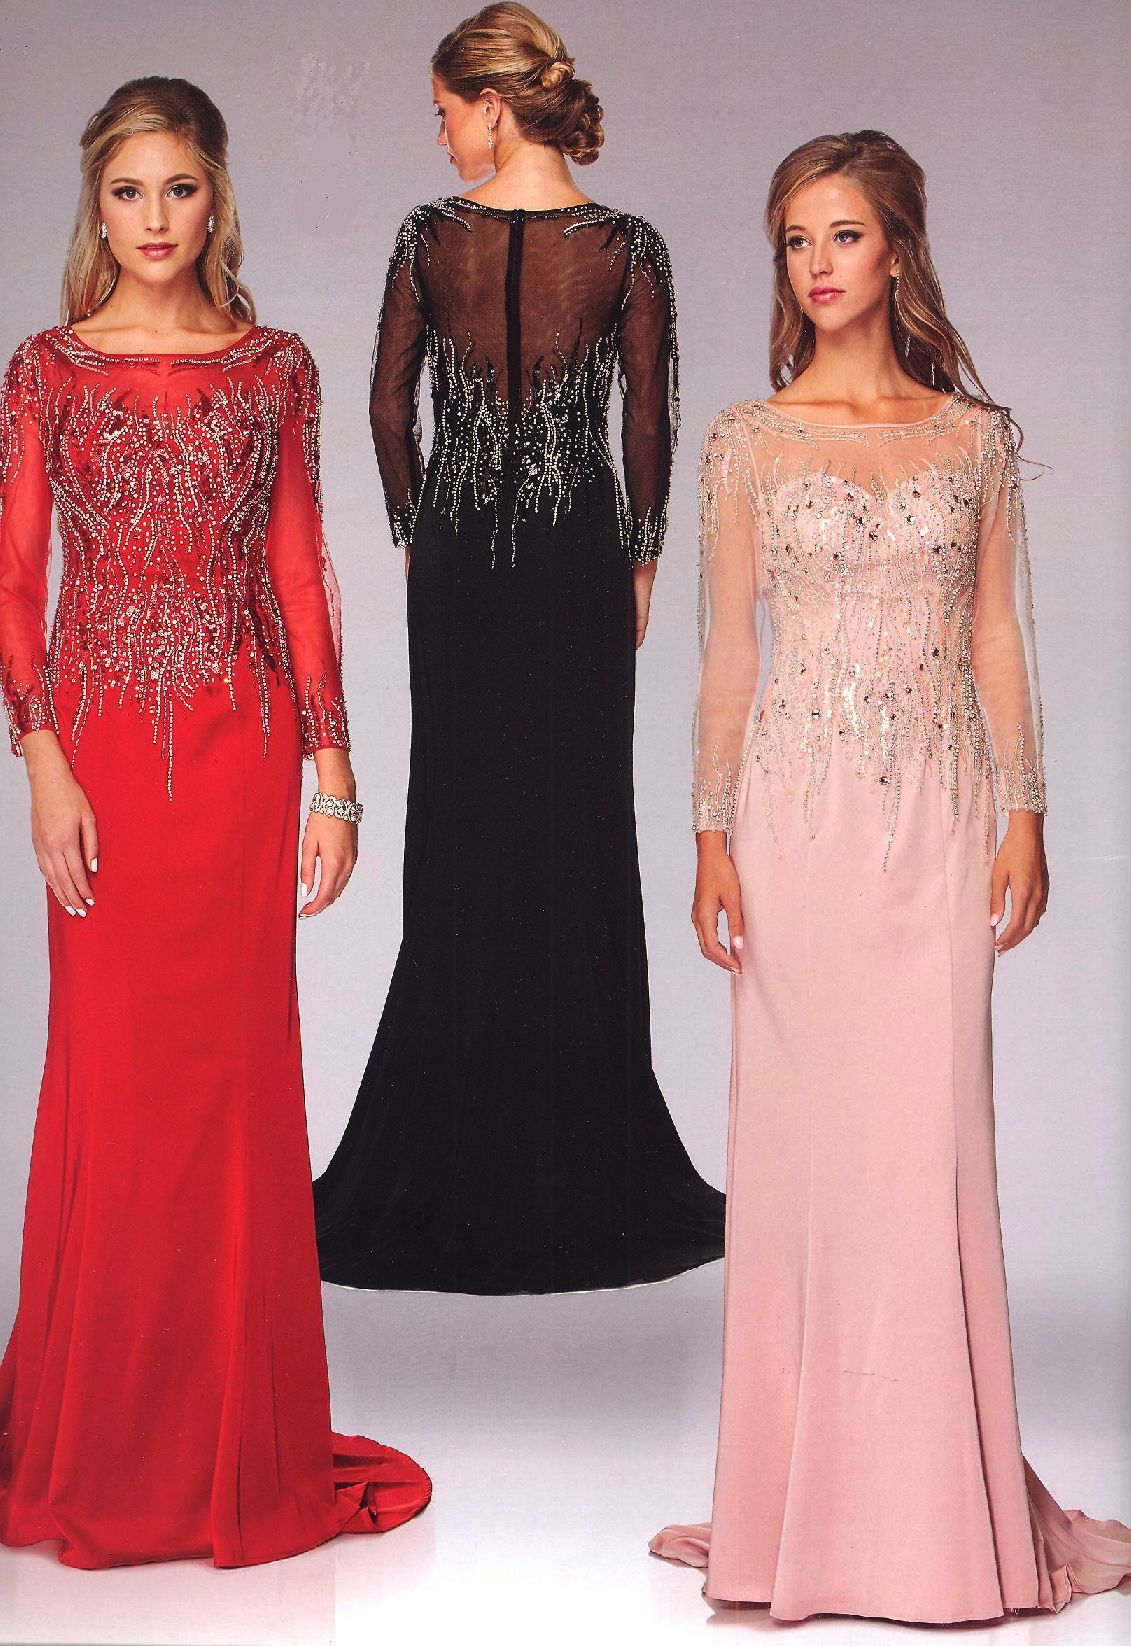 Wedding dresses under $300  Evening Dresses Mother of Bride Dresses UNDER ucBRueajtucBRueFull